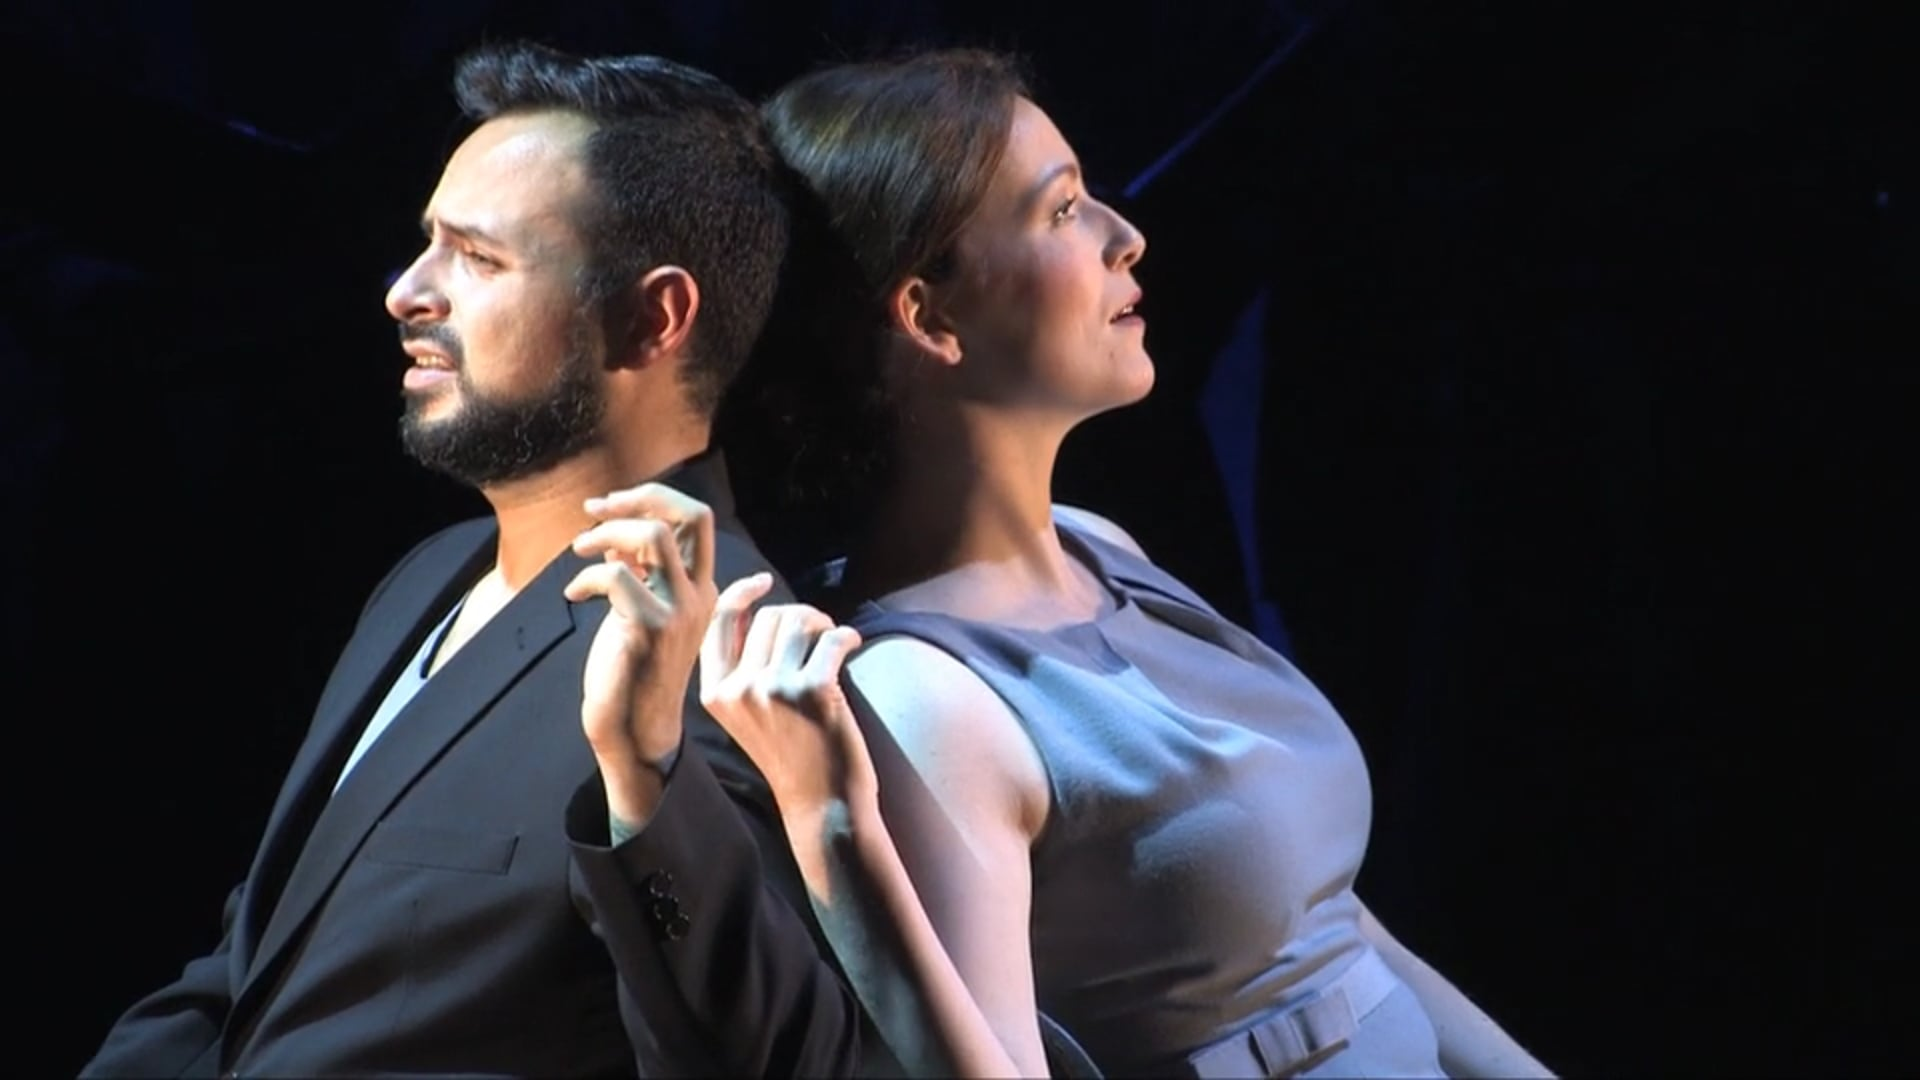 Orphée et Eurydice - Theater Aachen, Trailer 2